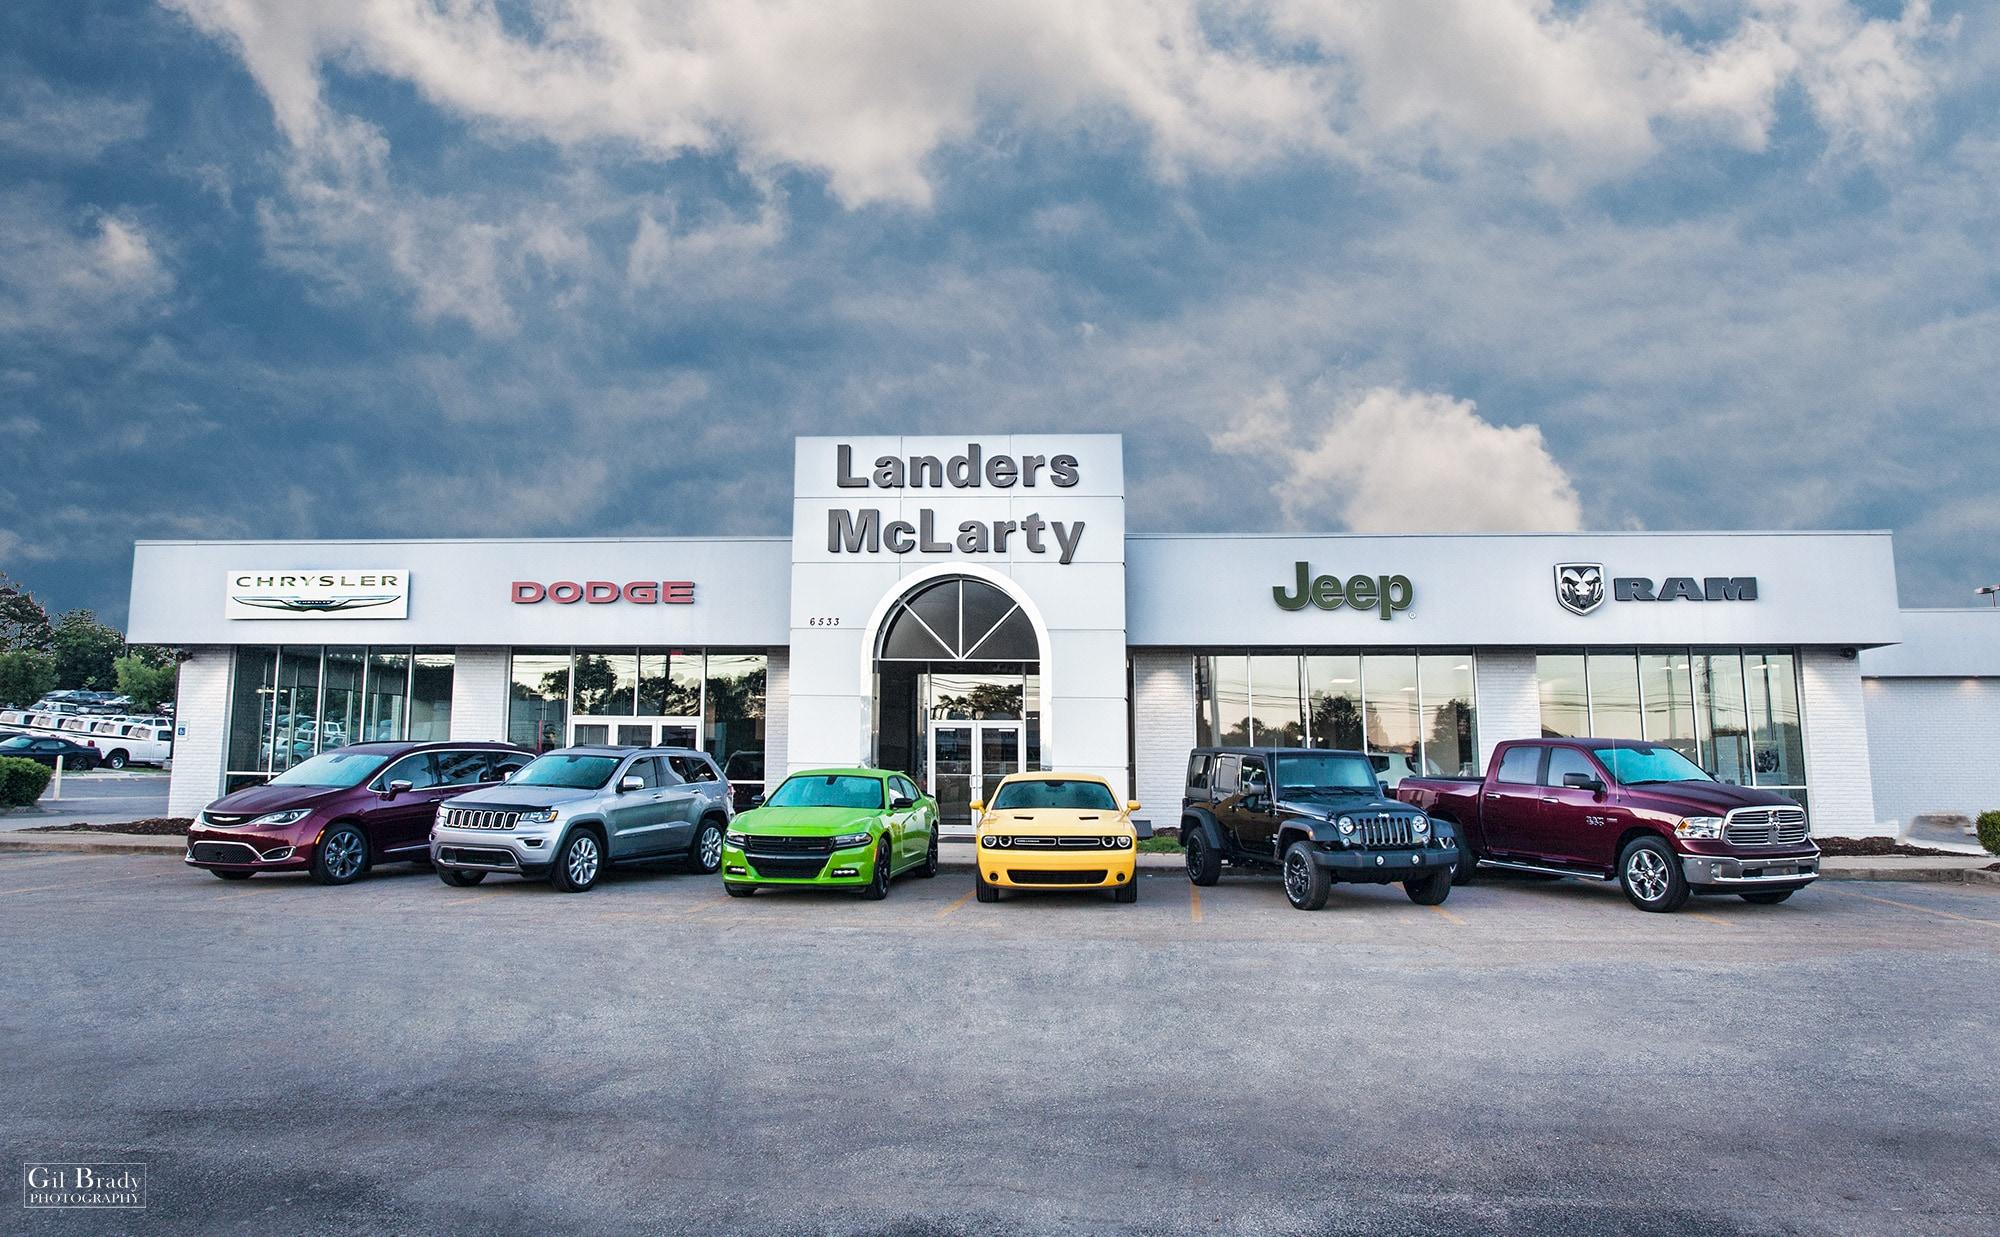 Landers Mclarty Chevrolet >> RML Automotive Locations | RML Automotive